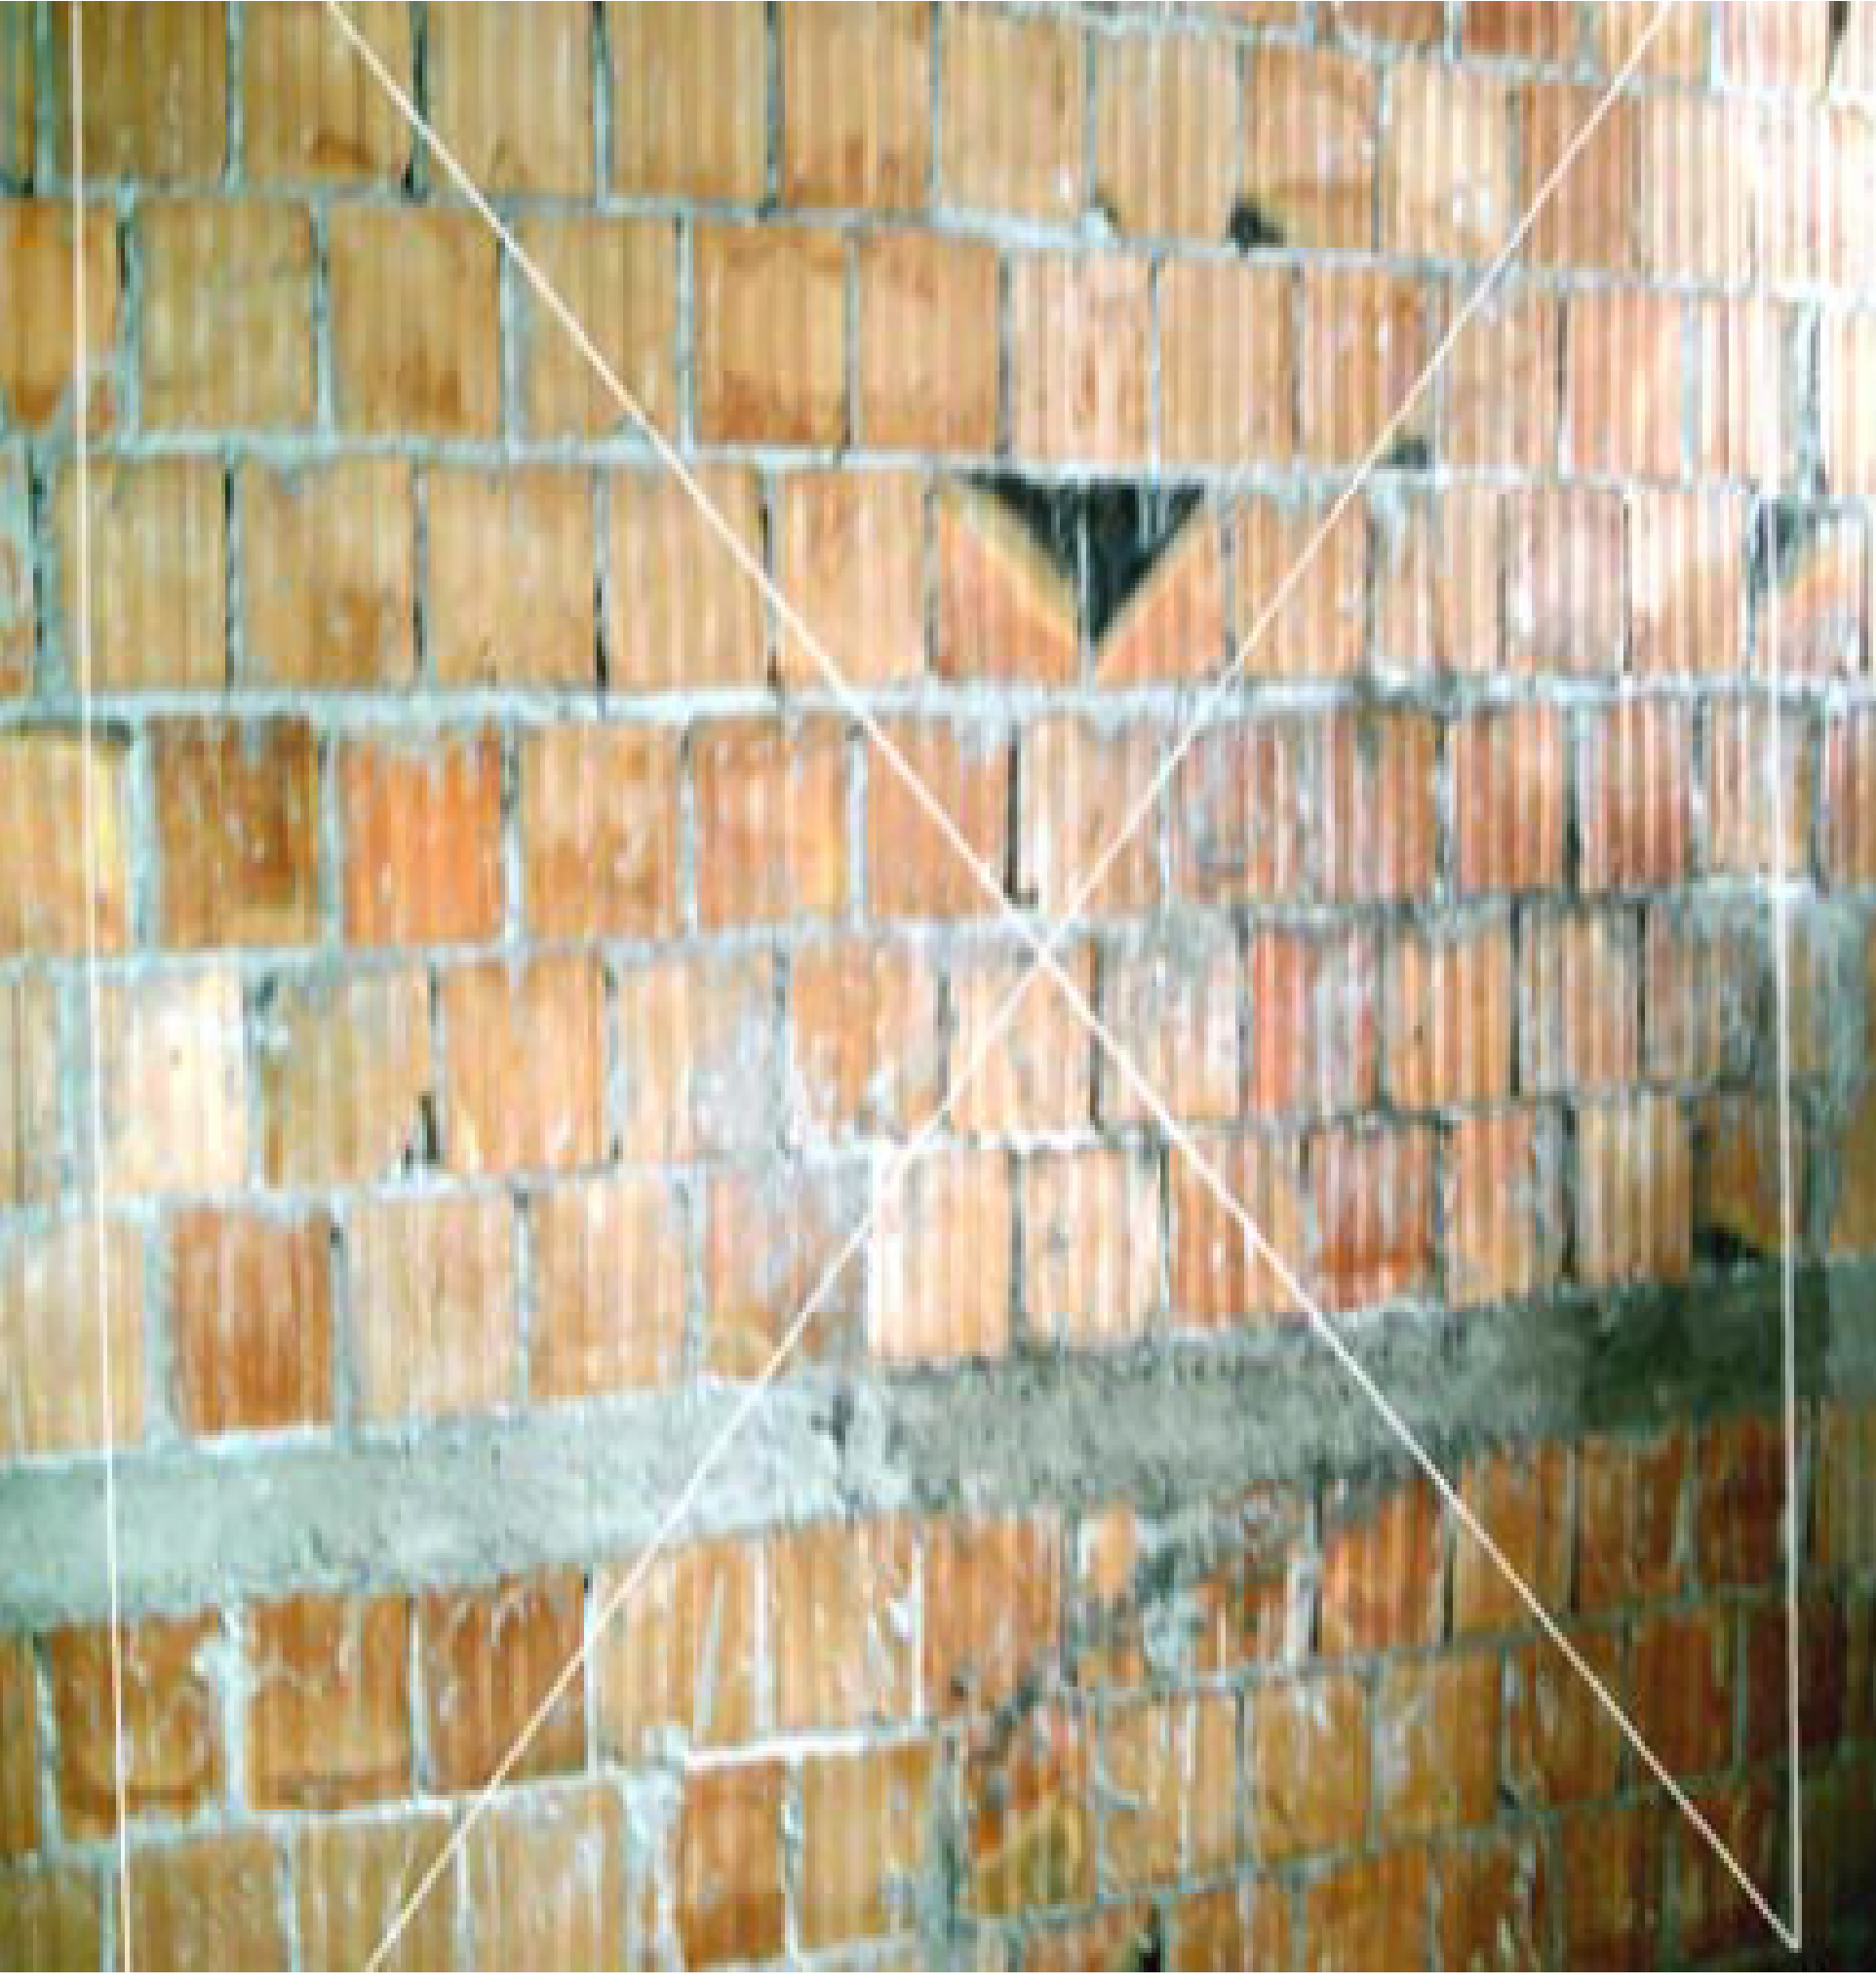 duvara ip çekilmesi